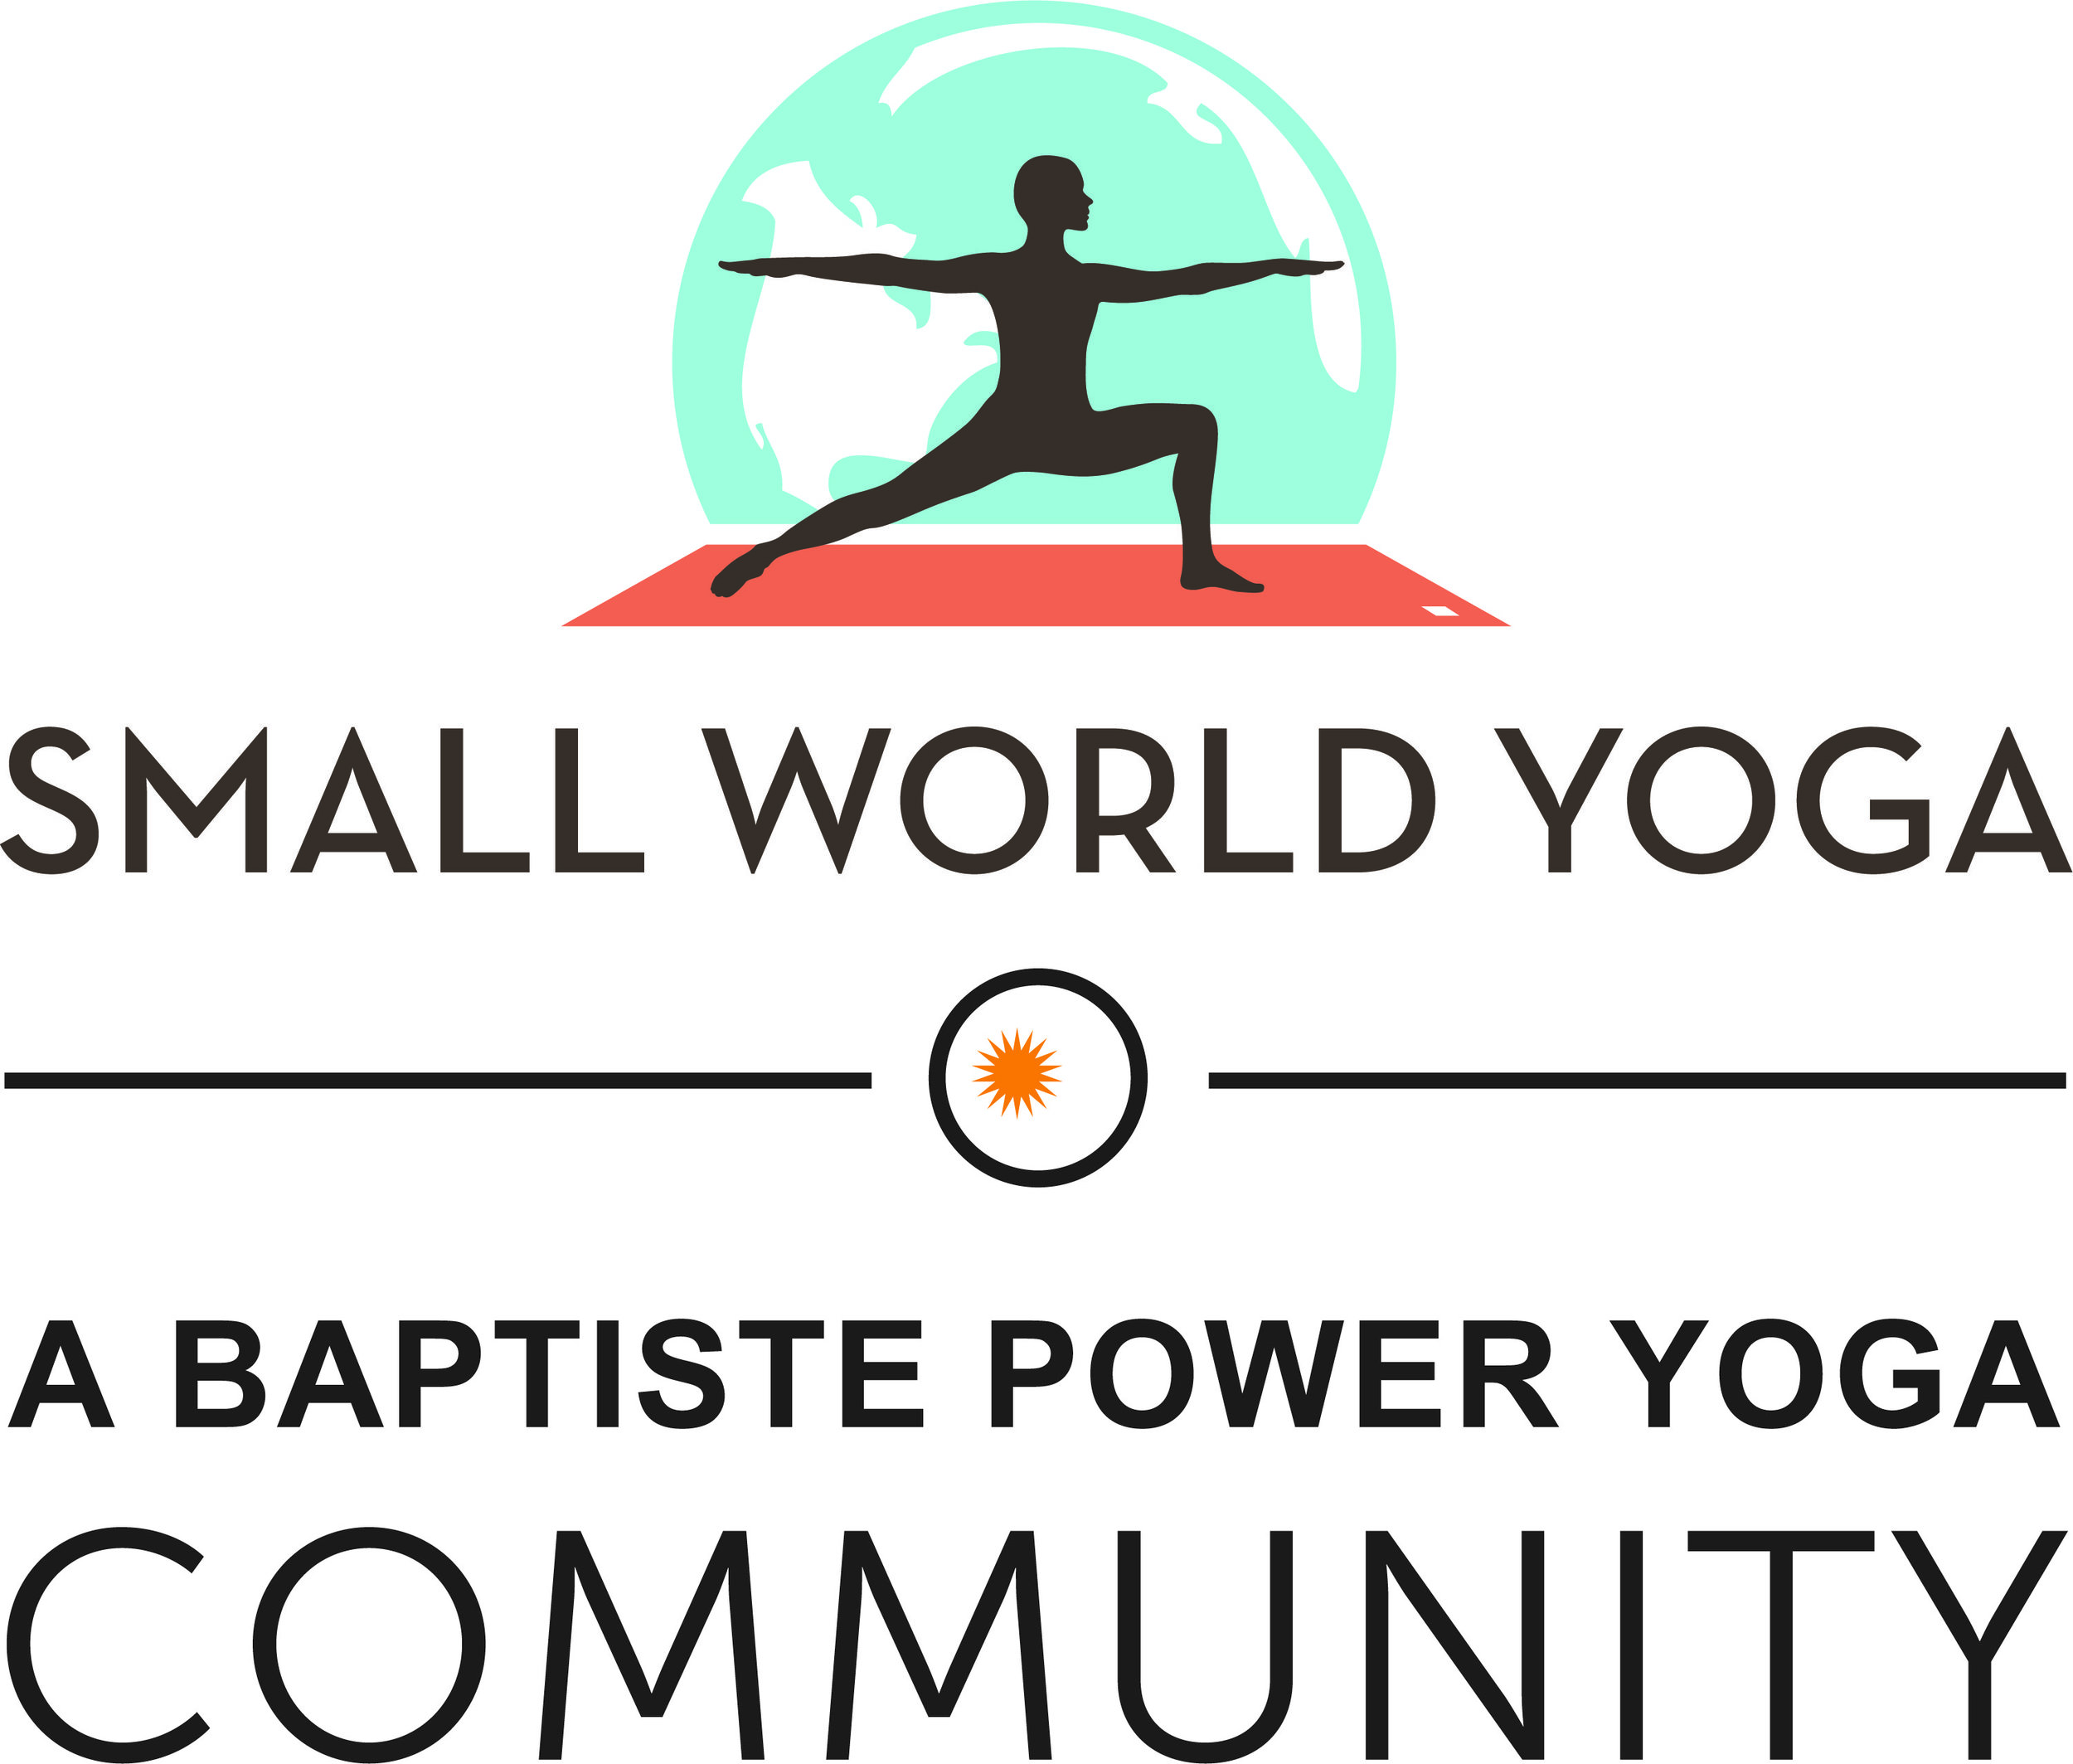 SmallWorldYoga-Baptiste.Community.jpg